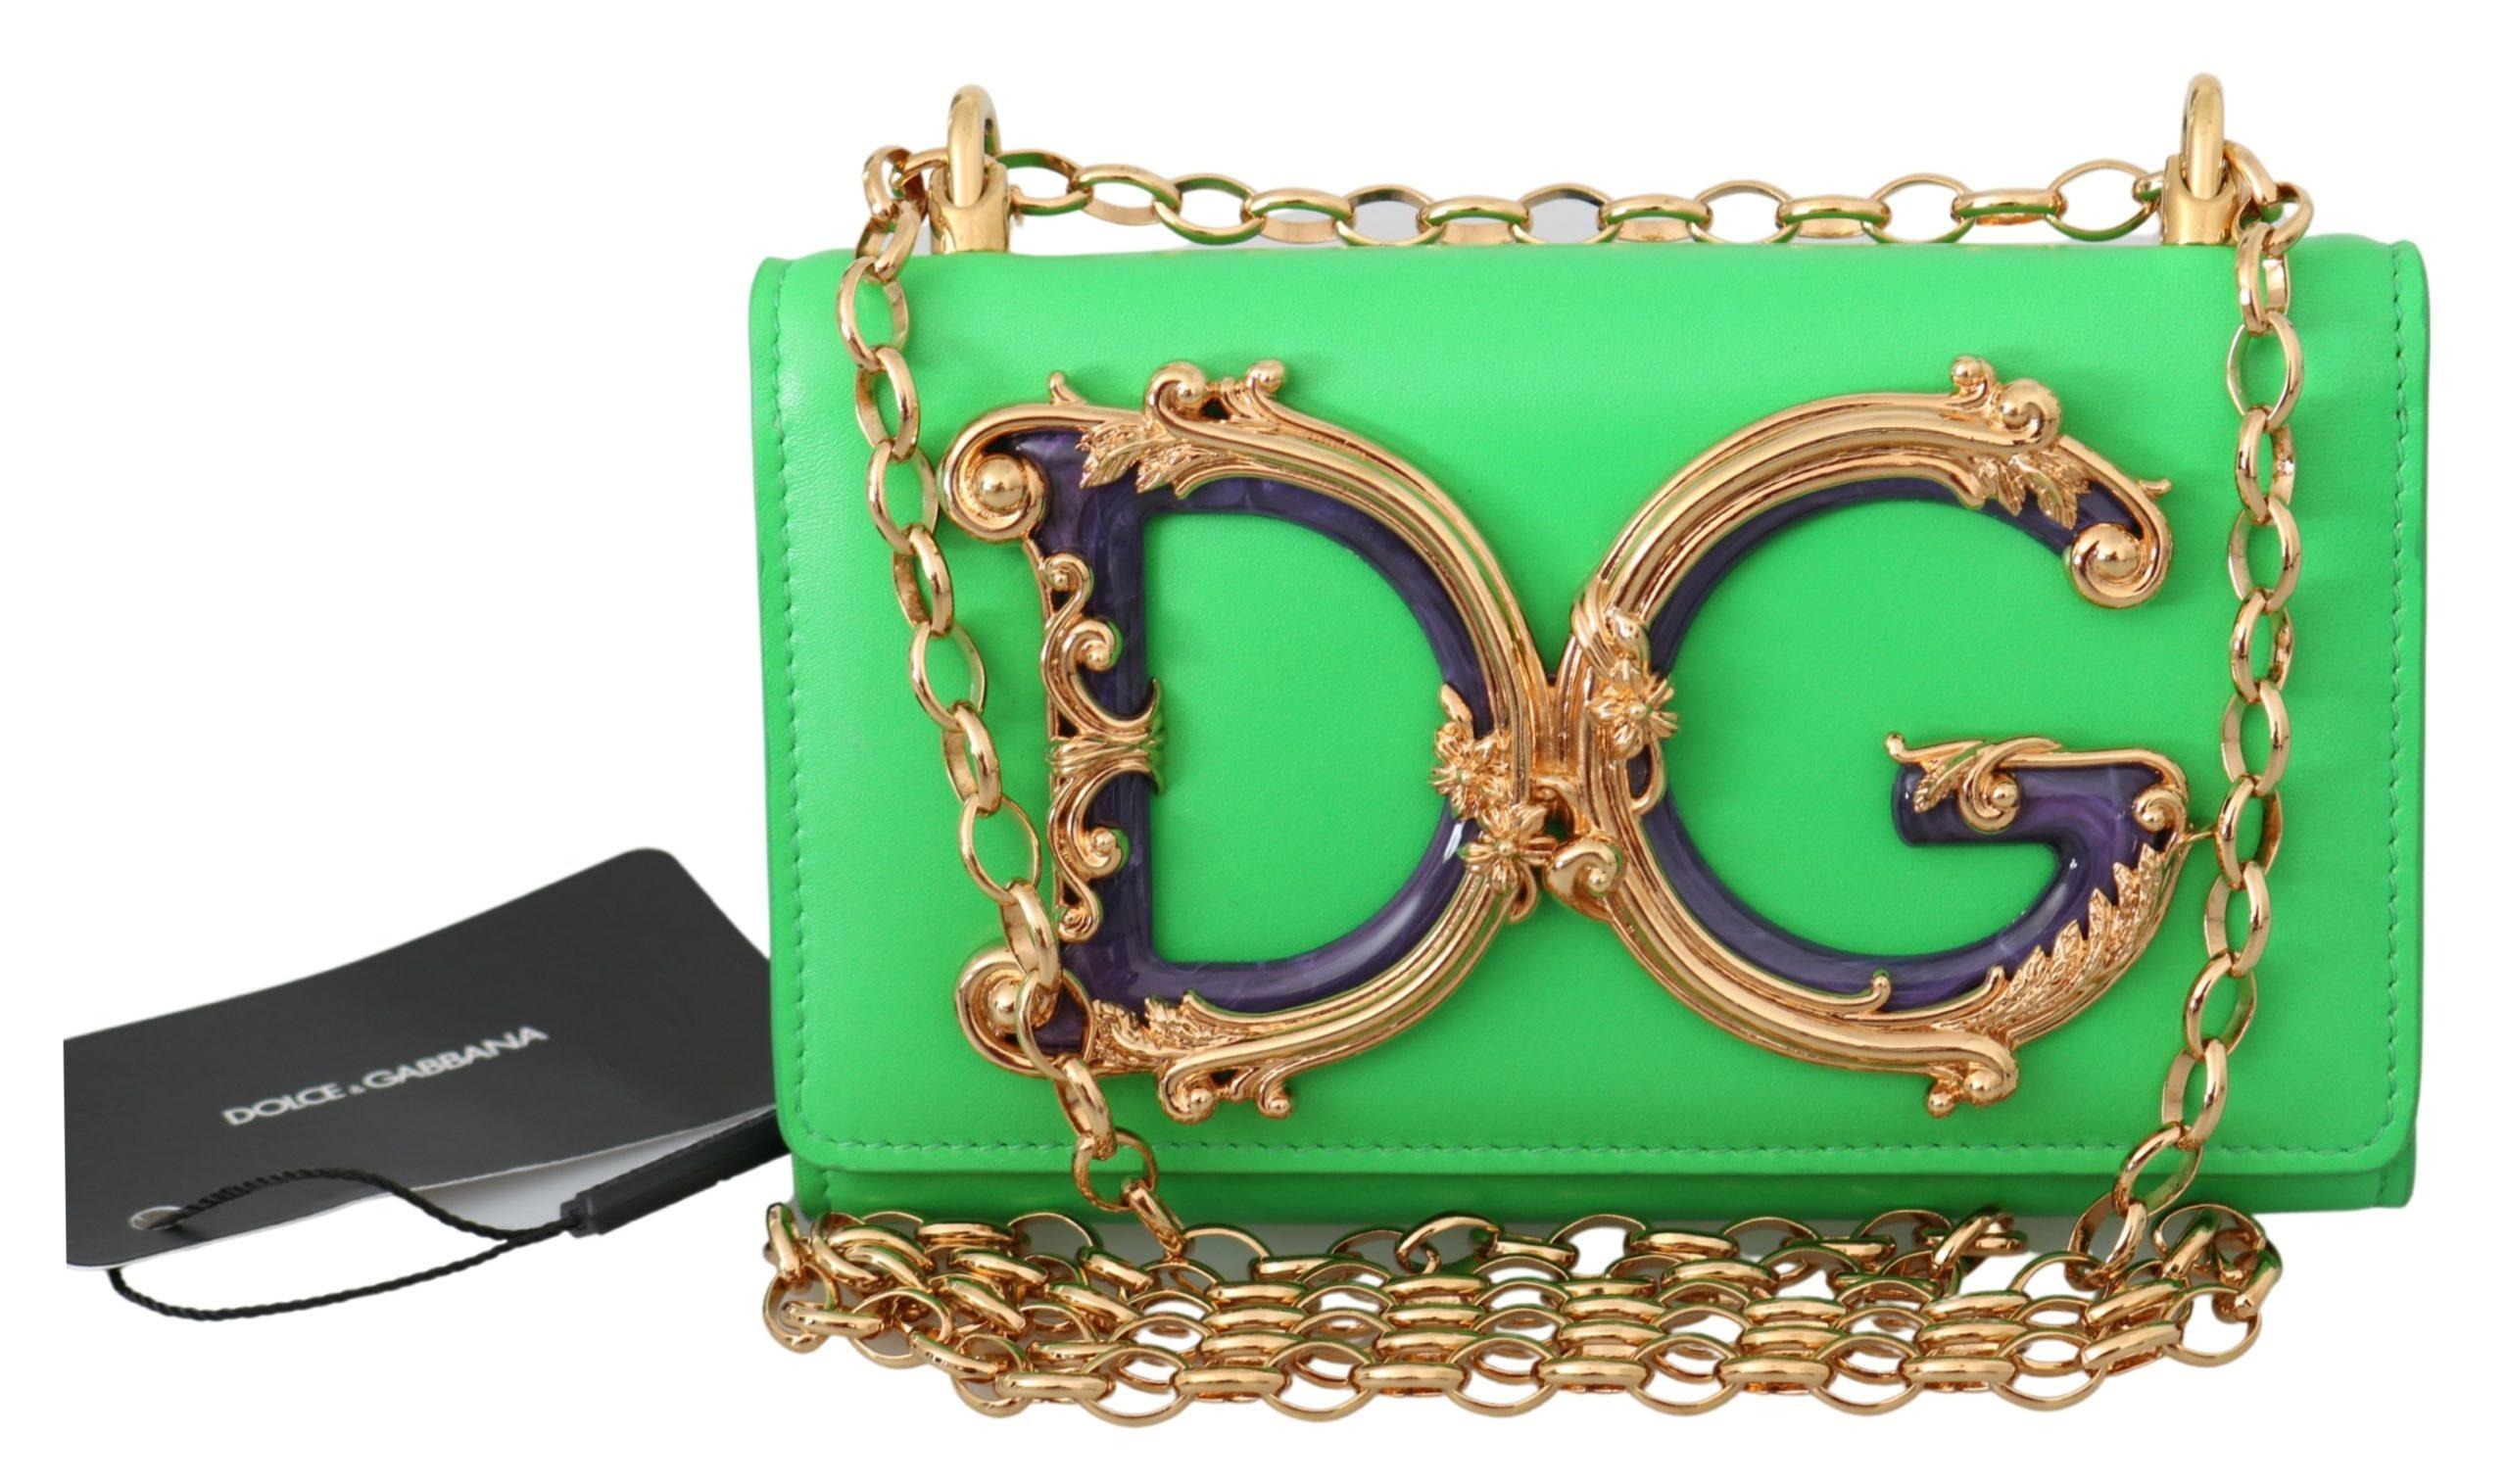 Dolce & Gabbana Women's Leather Logo iPhone X Cover Crossbody Bag Green VAS9907